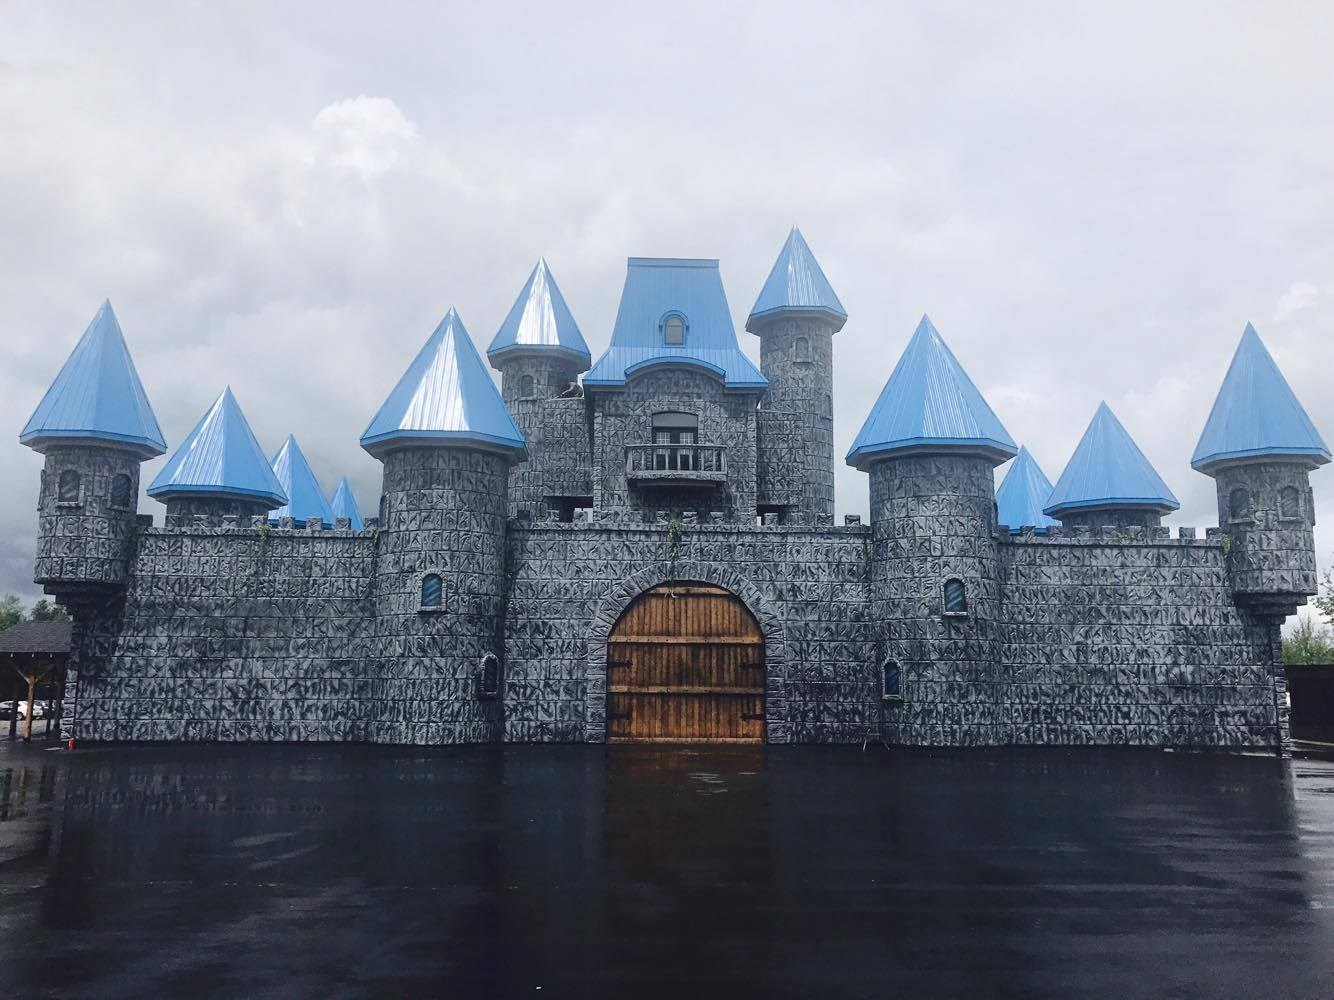 http://www.campingatlantide.com/wp-content/uploads/2017/06/chateau-magique-complexe-atlantide-1.jpg